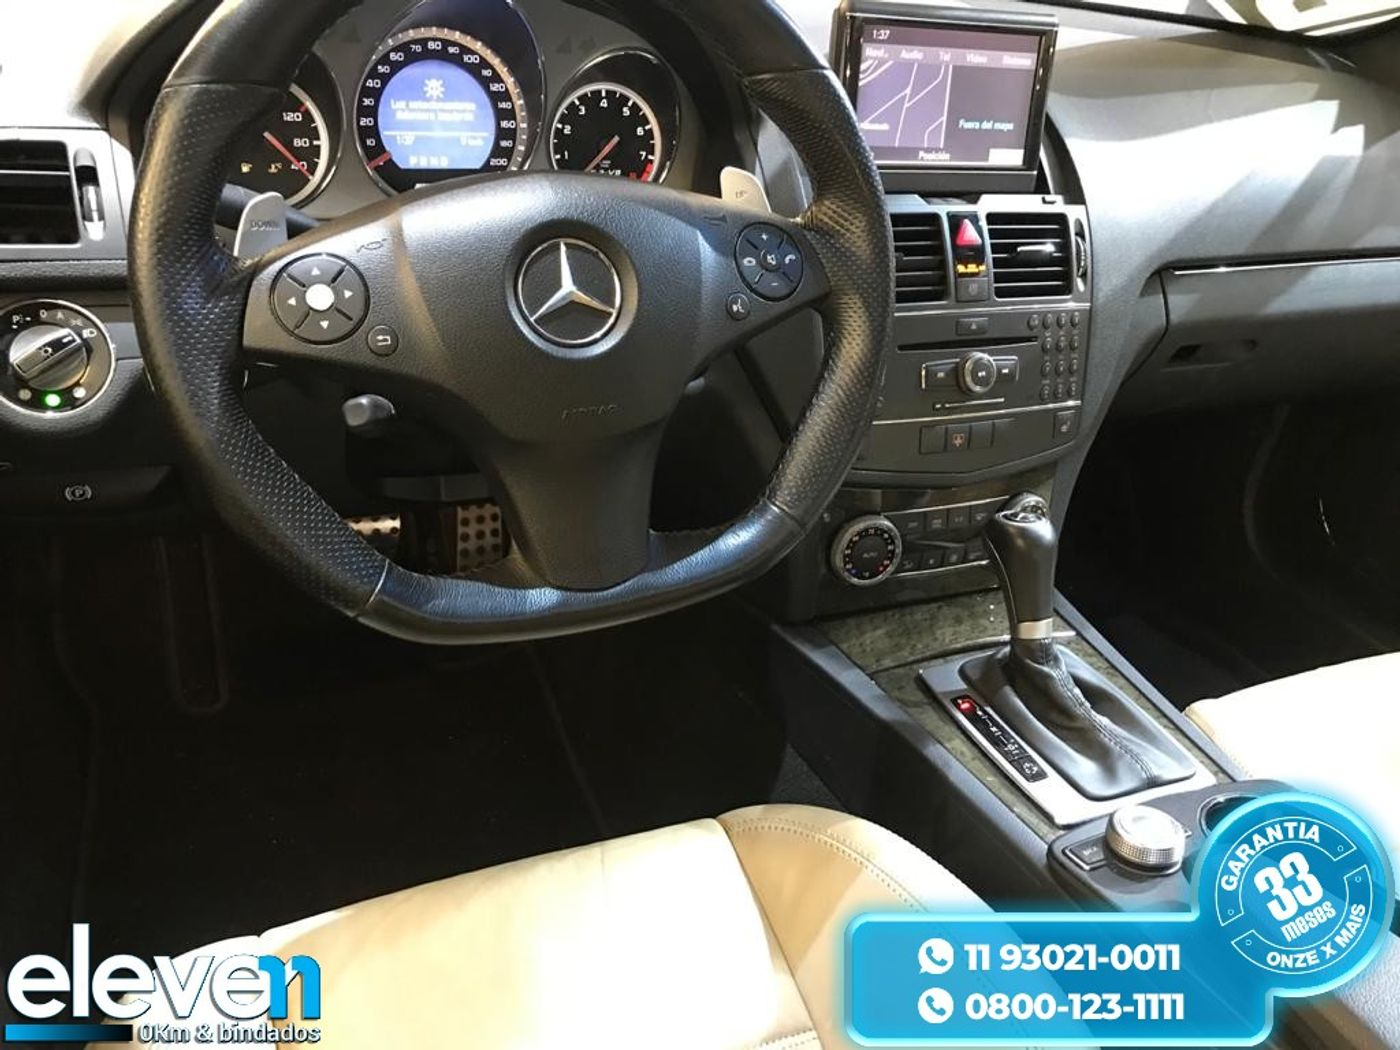 Mercedes C-63 AMG 6.2 V8 Aut.